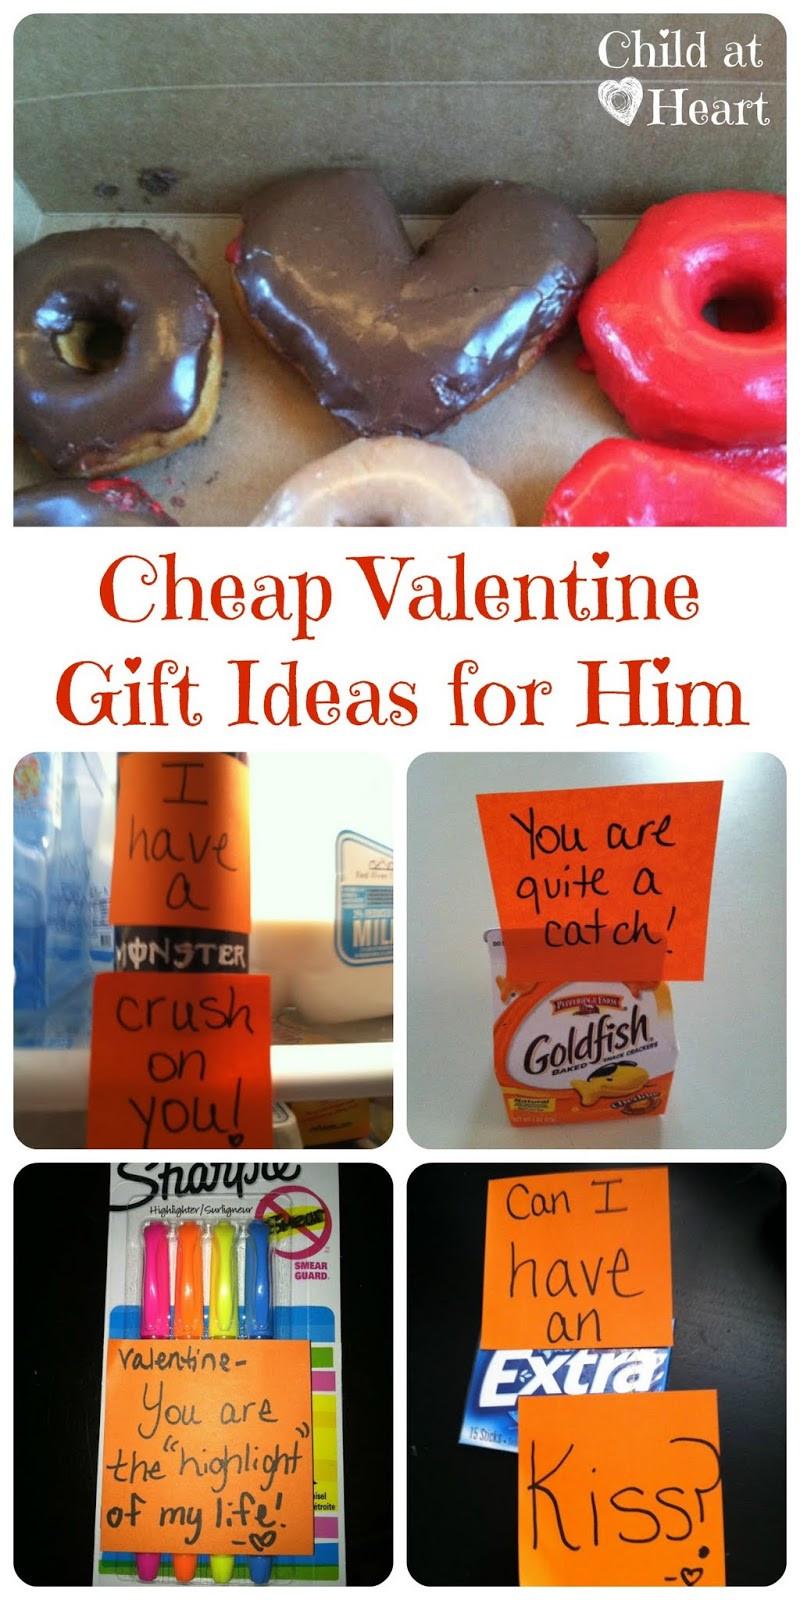 Valentine Day Gift Ideas Him  Cheap Valentine Gift Ideas for Him Child at Heart Blog